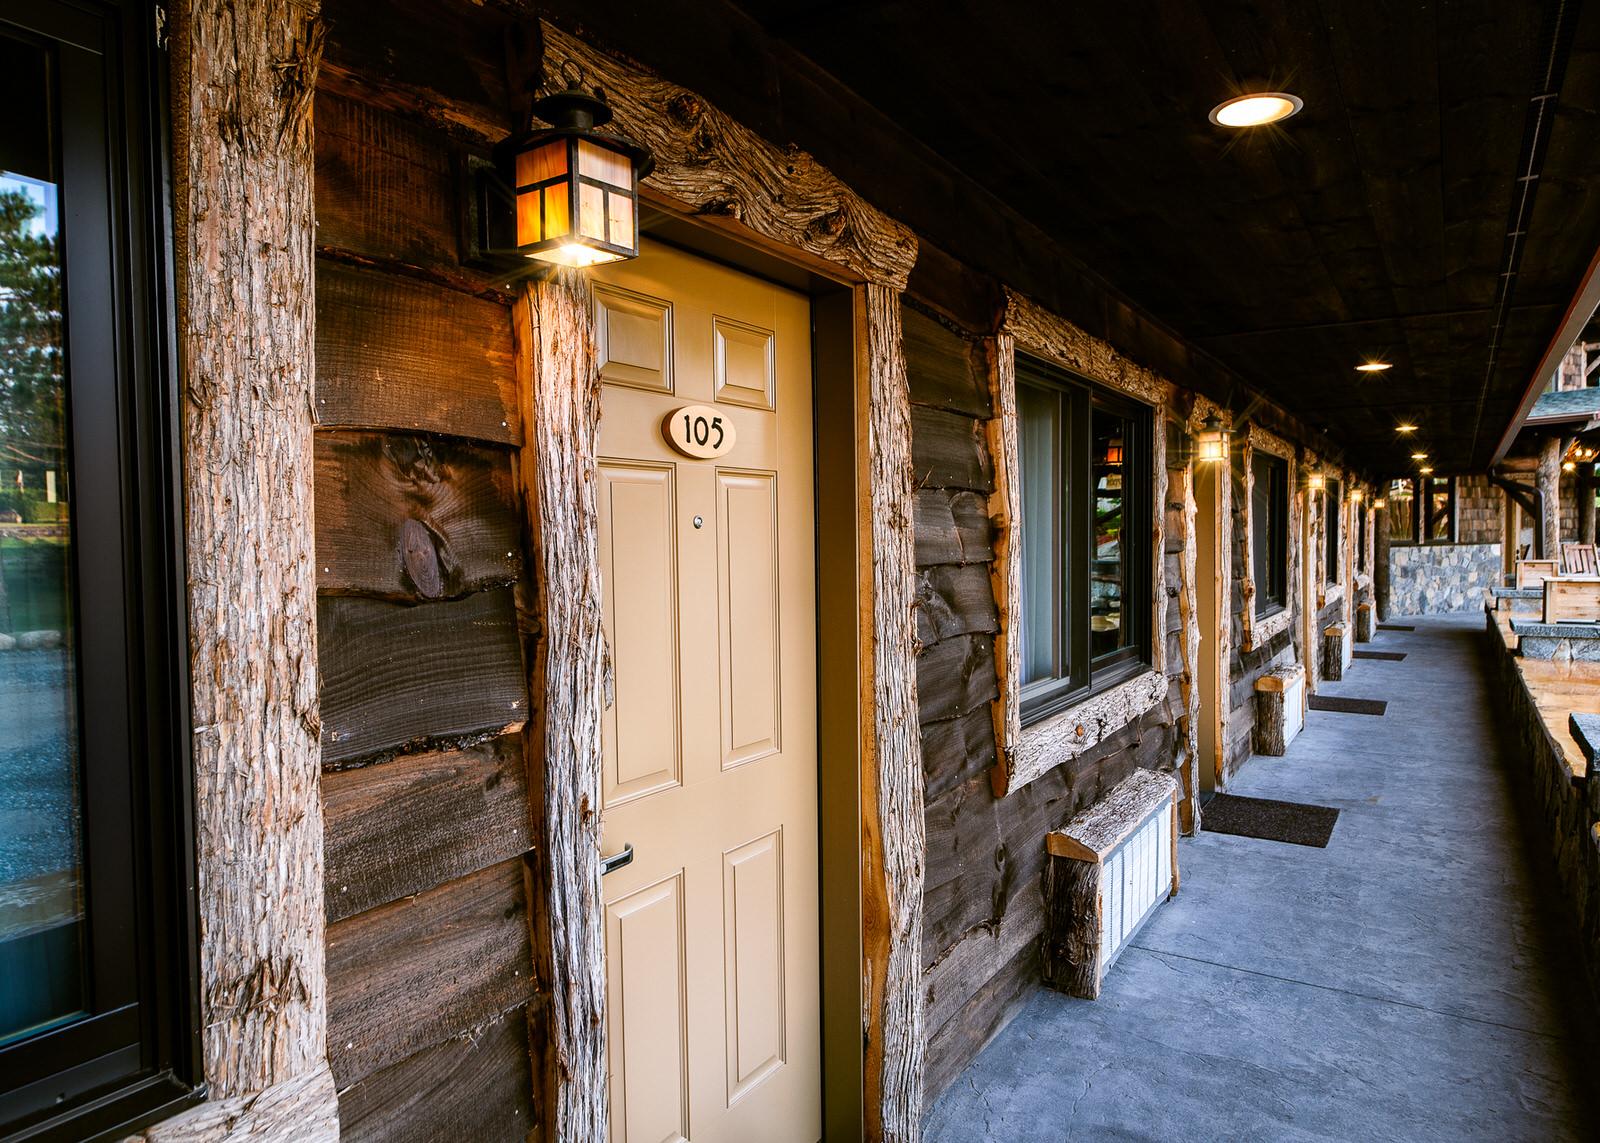 Adk-Spruce-Lodge-2048px-54.jpg